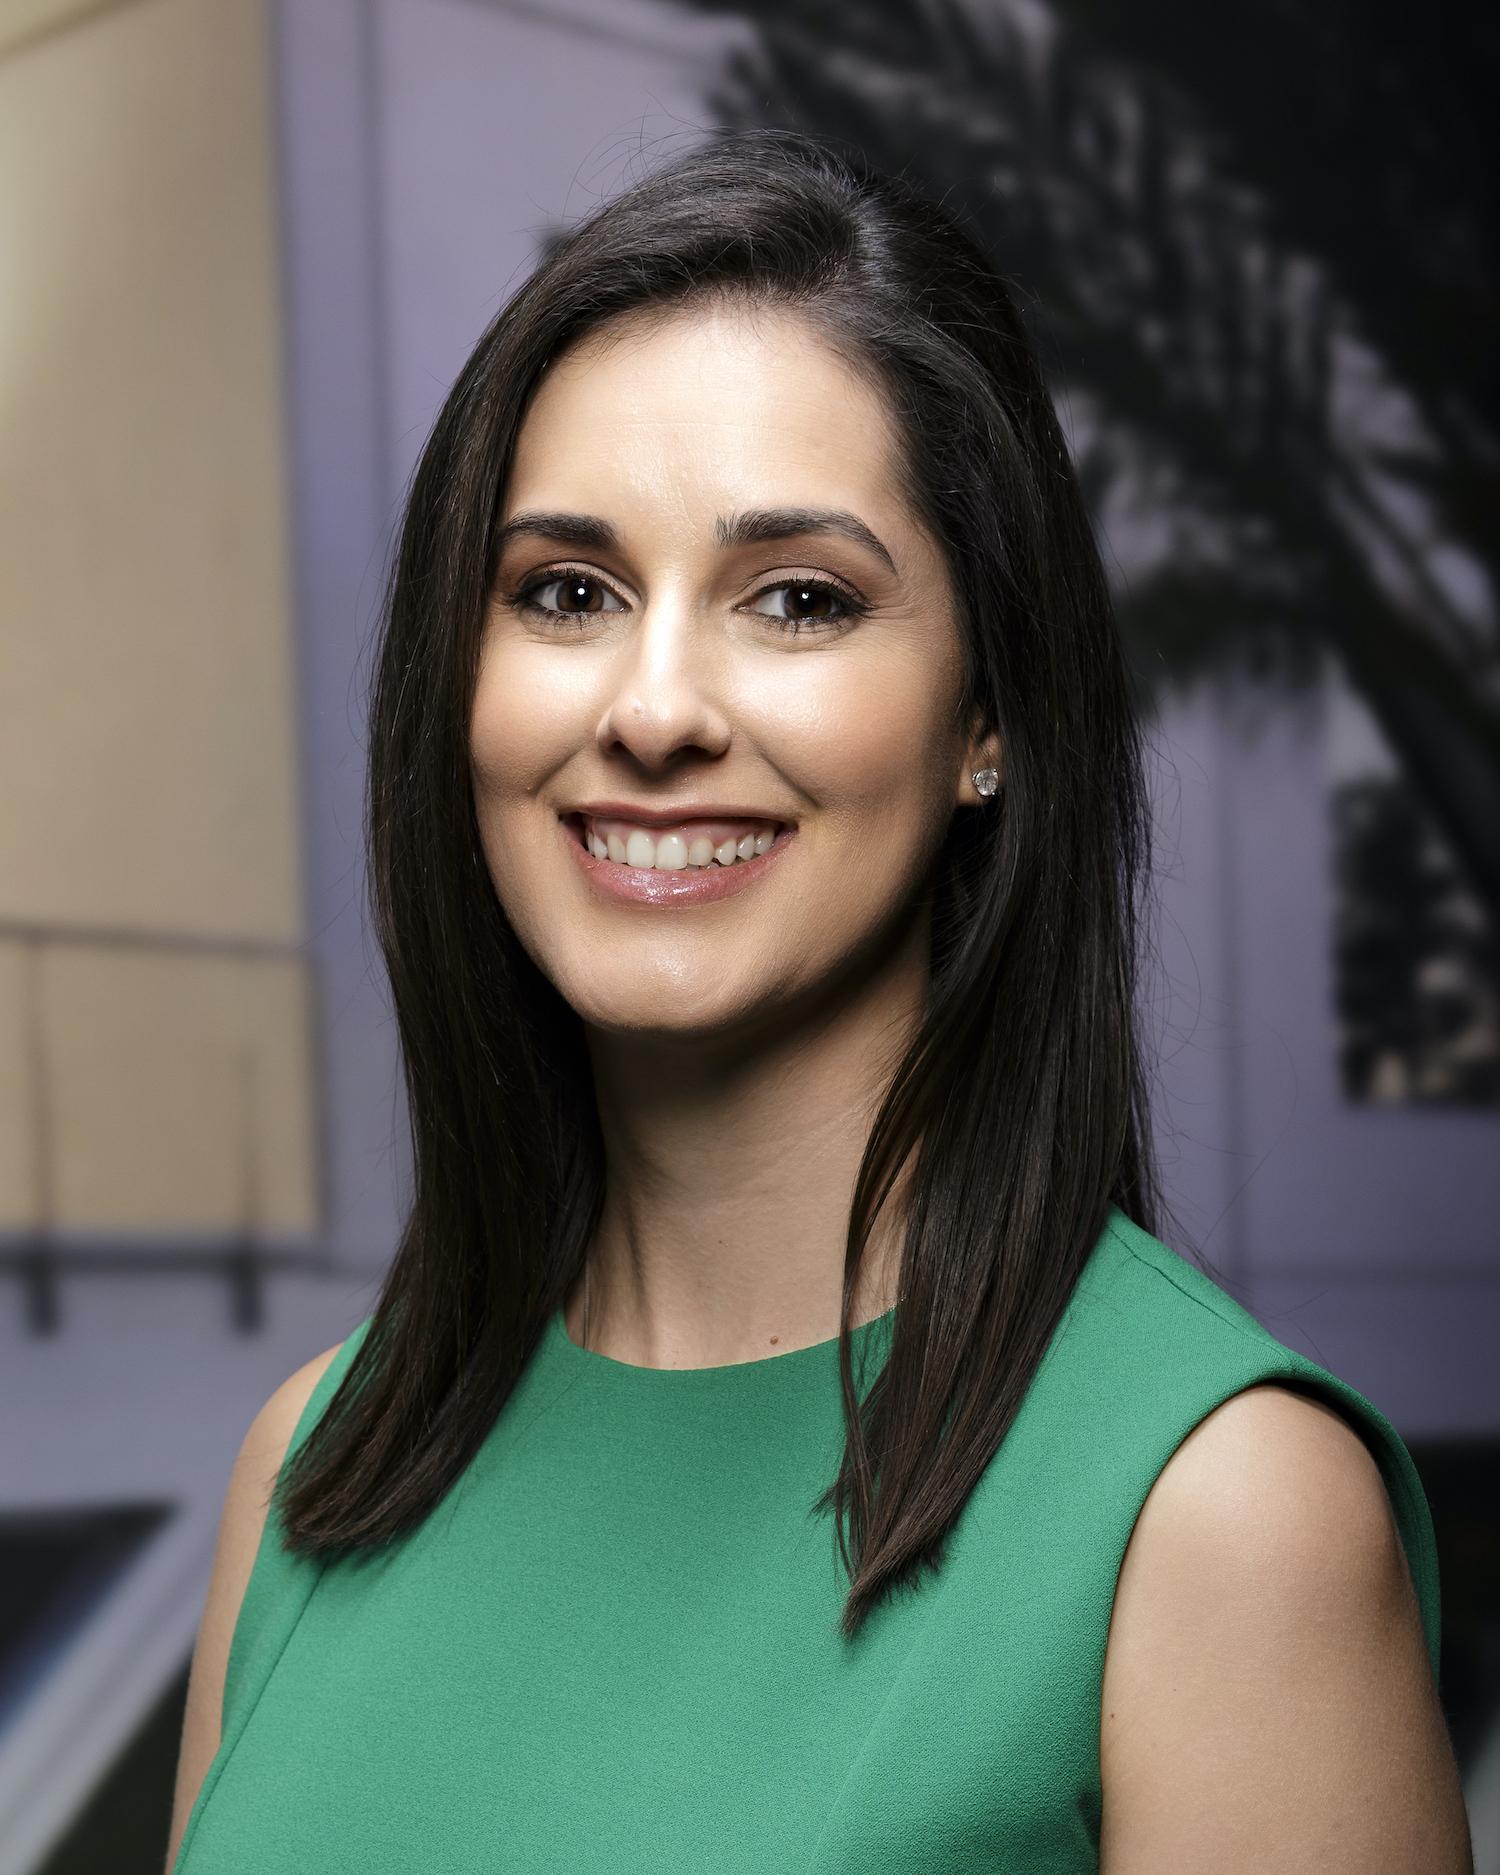 Marianne Mijares